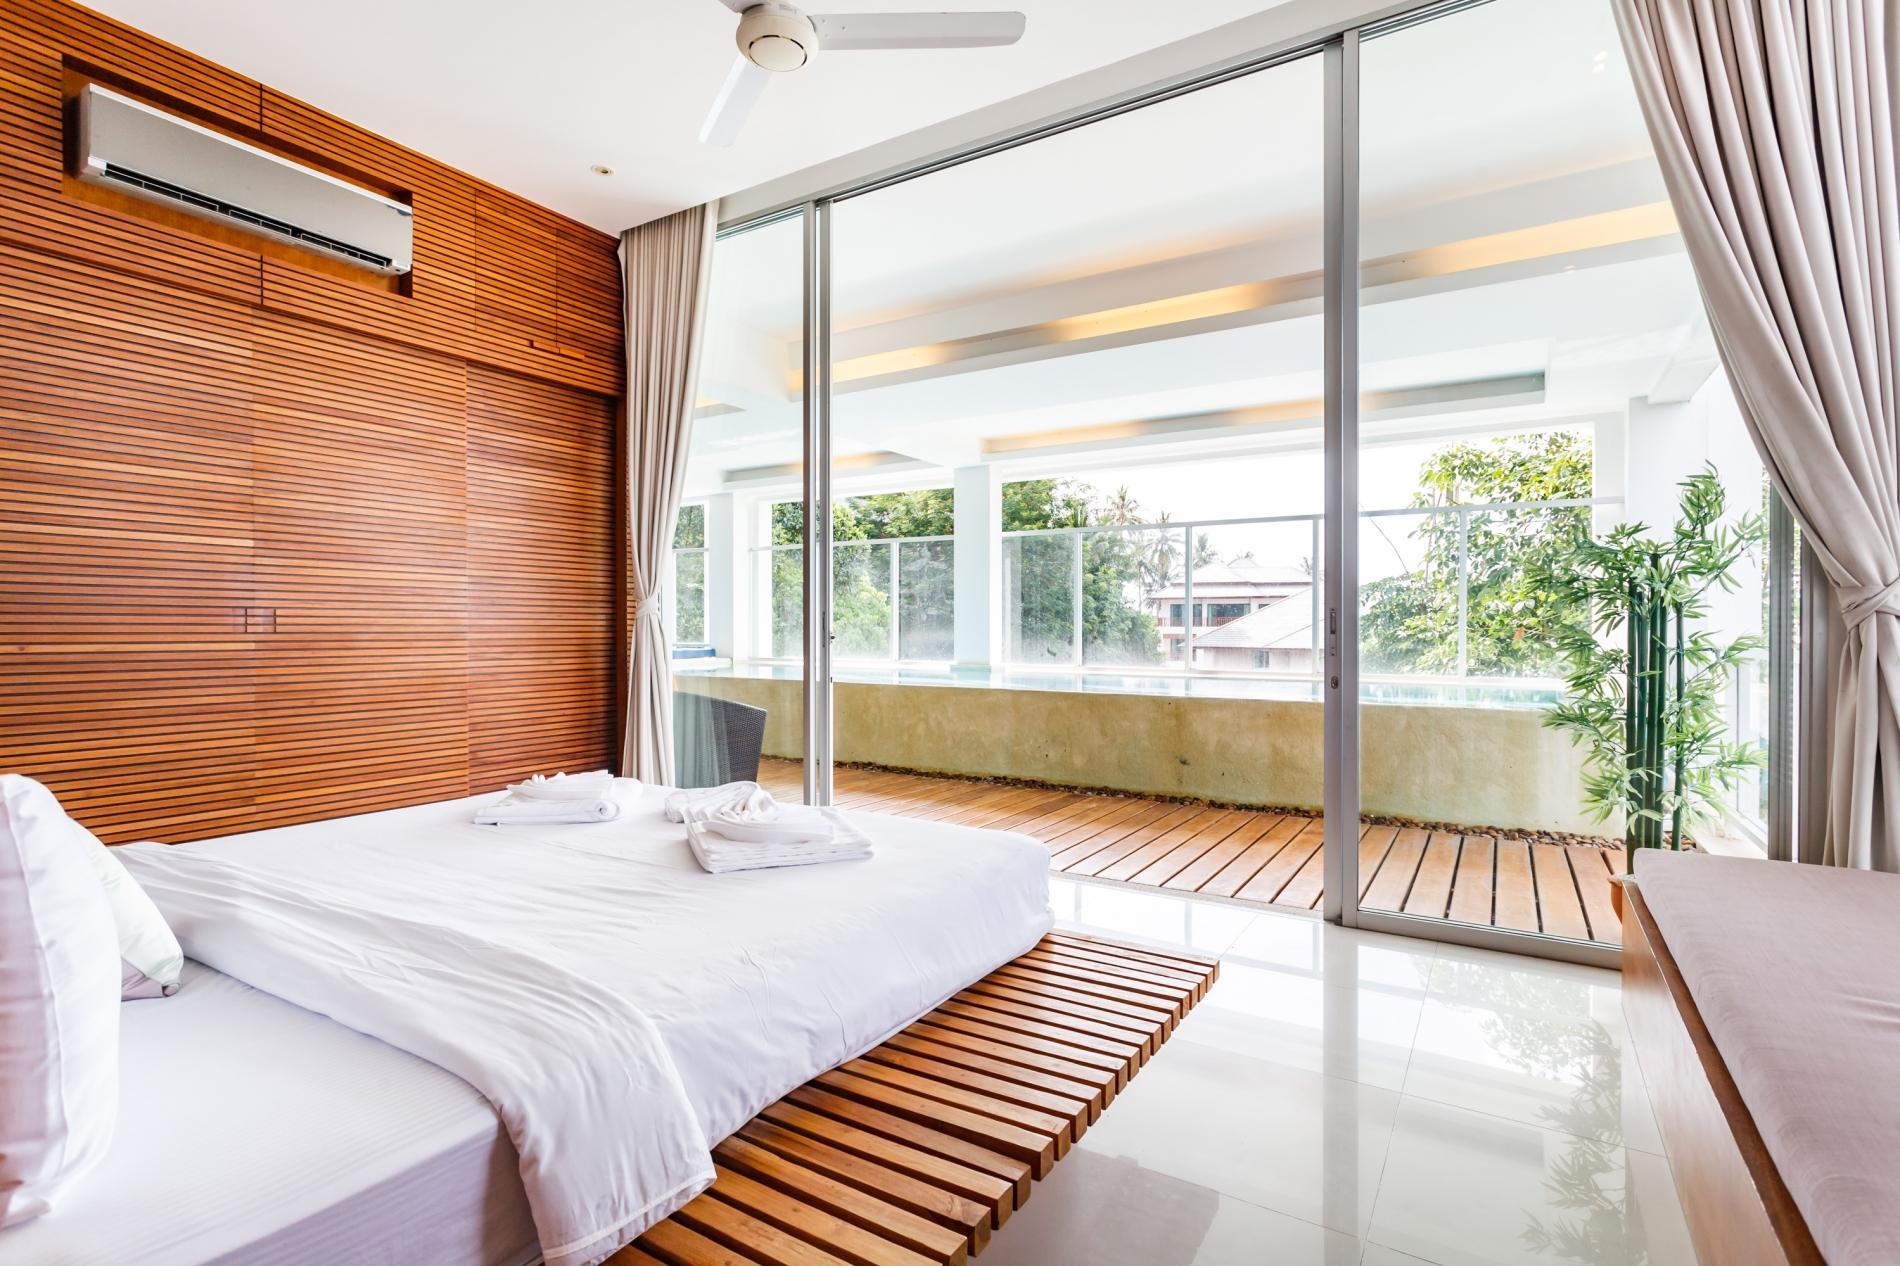 Apartment The Quarter 301 - Luxury Surin 3 bedroom apartment private pool photo 20401870